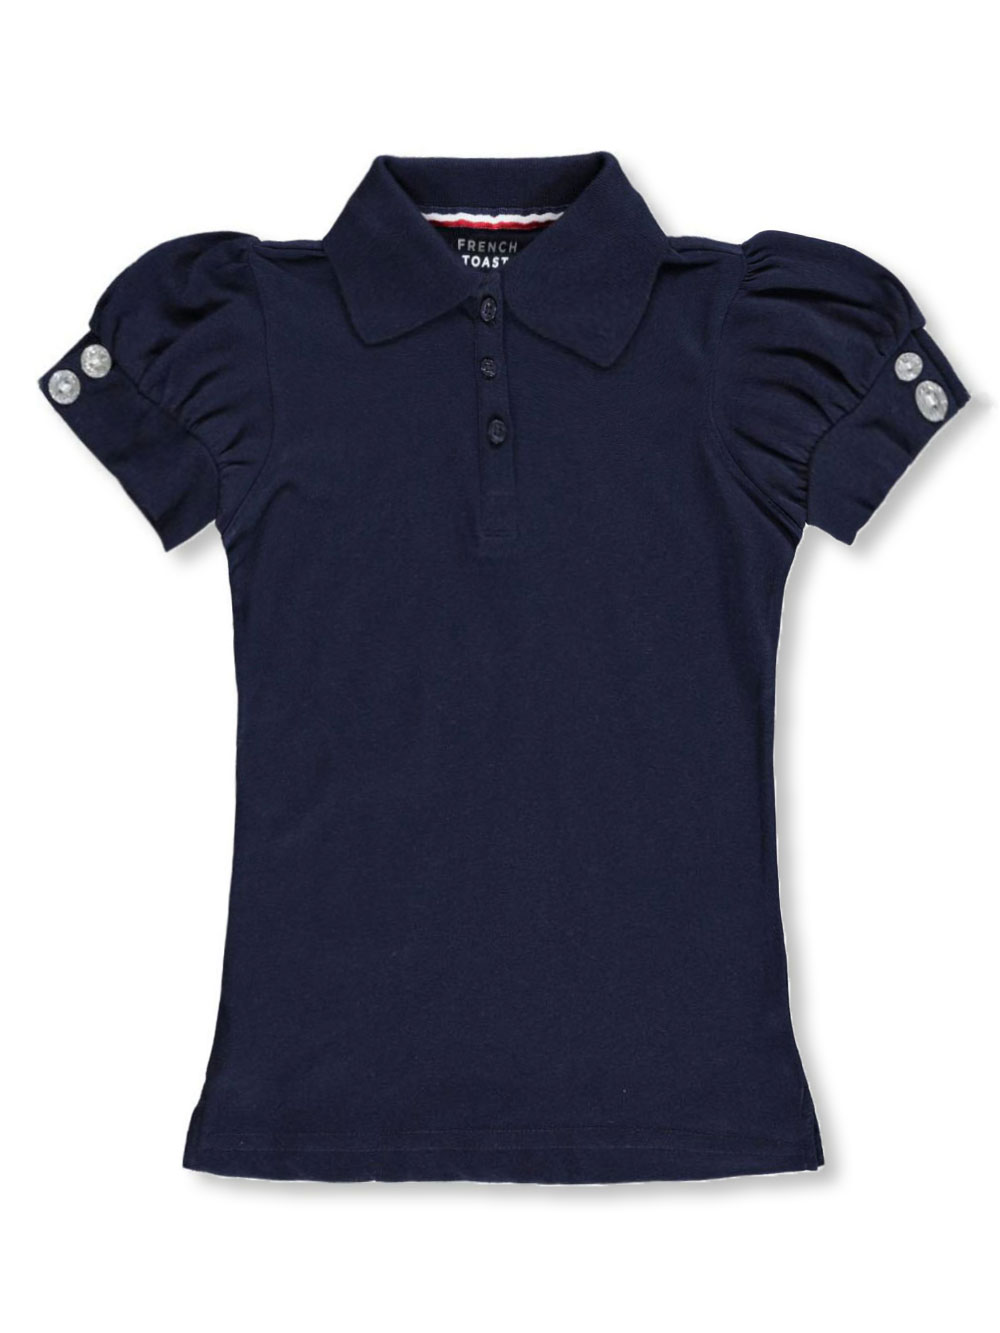 Image of French Toast School Uniform Big Girls Rhinestone SS Polo Shirt Sizes 7  16  navy 14  16